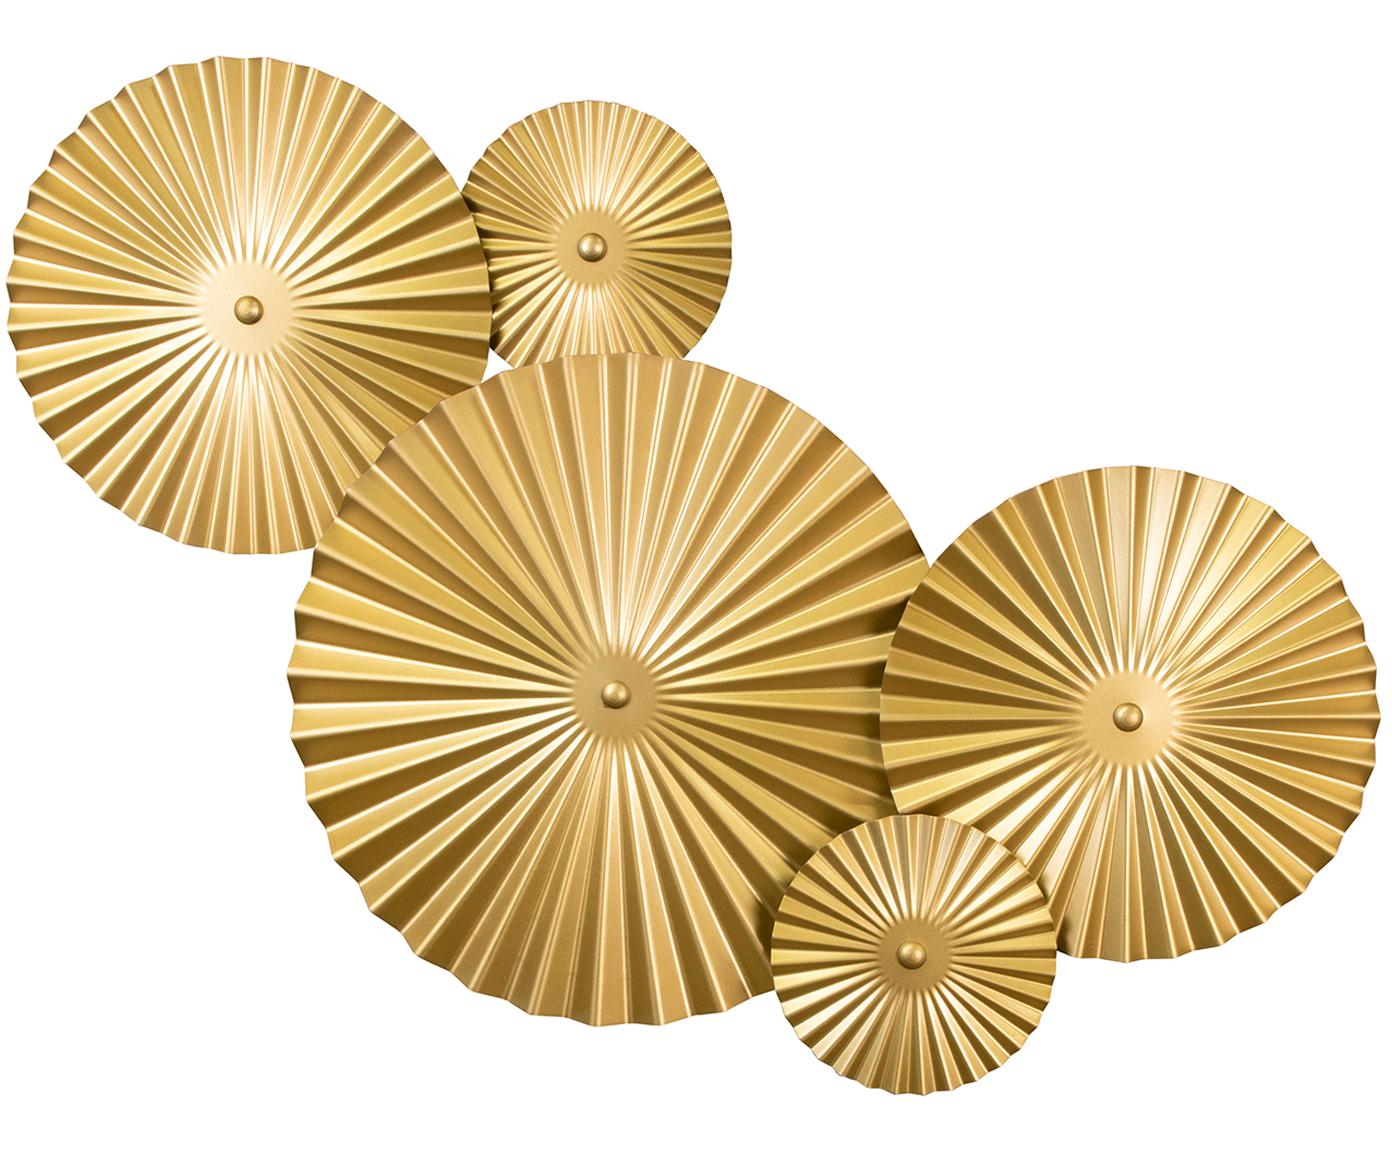 Design wandlamp Omega met stekker, Lamp: vermessingd metaal, Messingkleurig, 70 x 55 cm